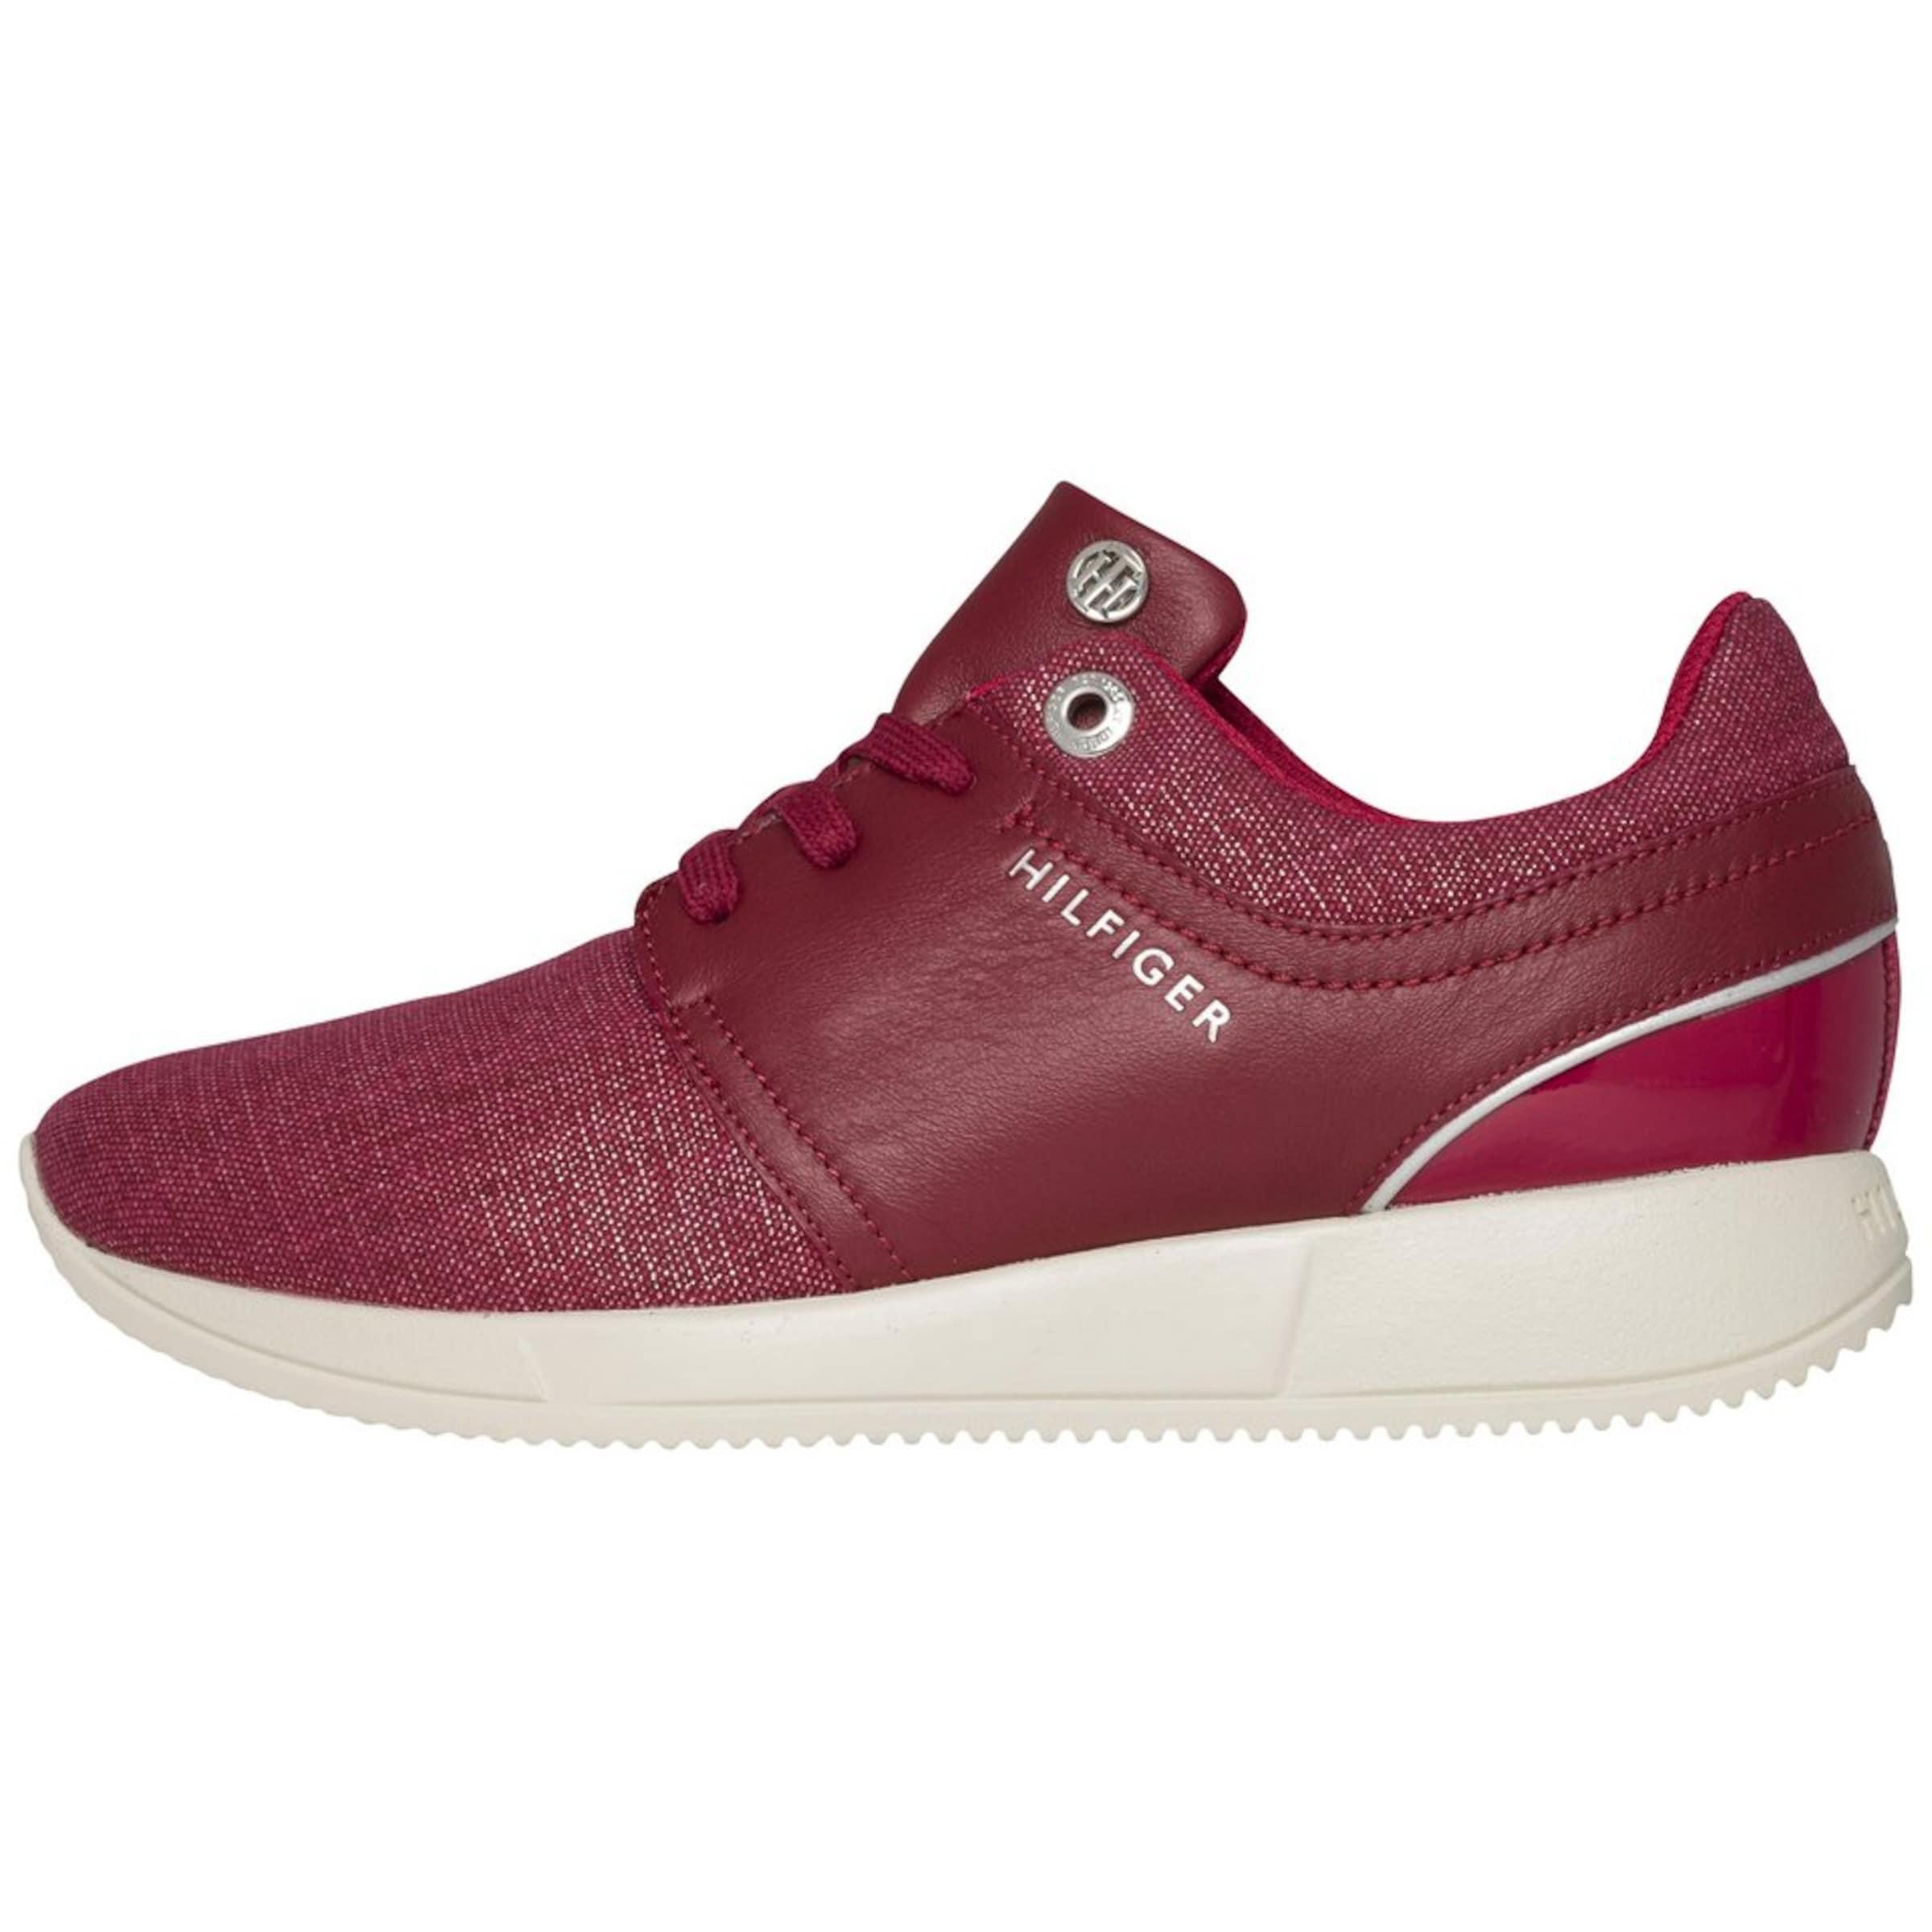 TOMMY HILFIGER Sneaker »S1285AMANTHA 2C4« Hohe Qualität